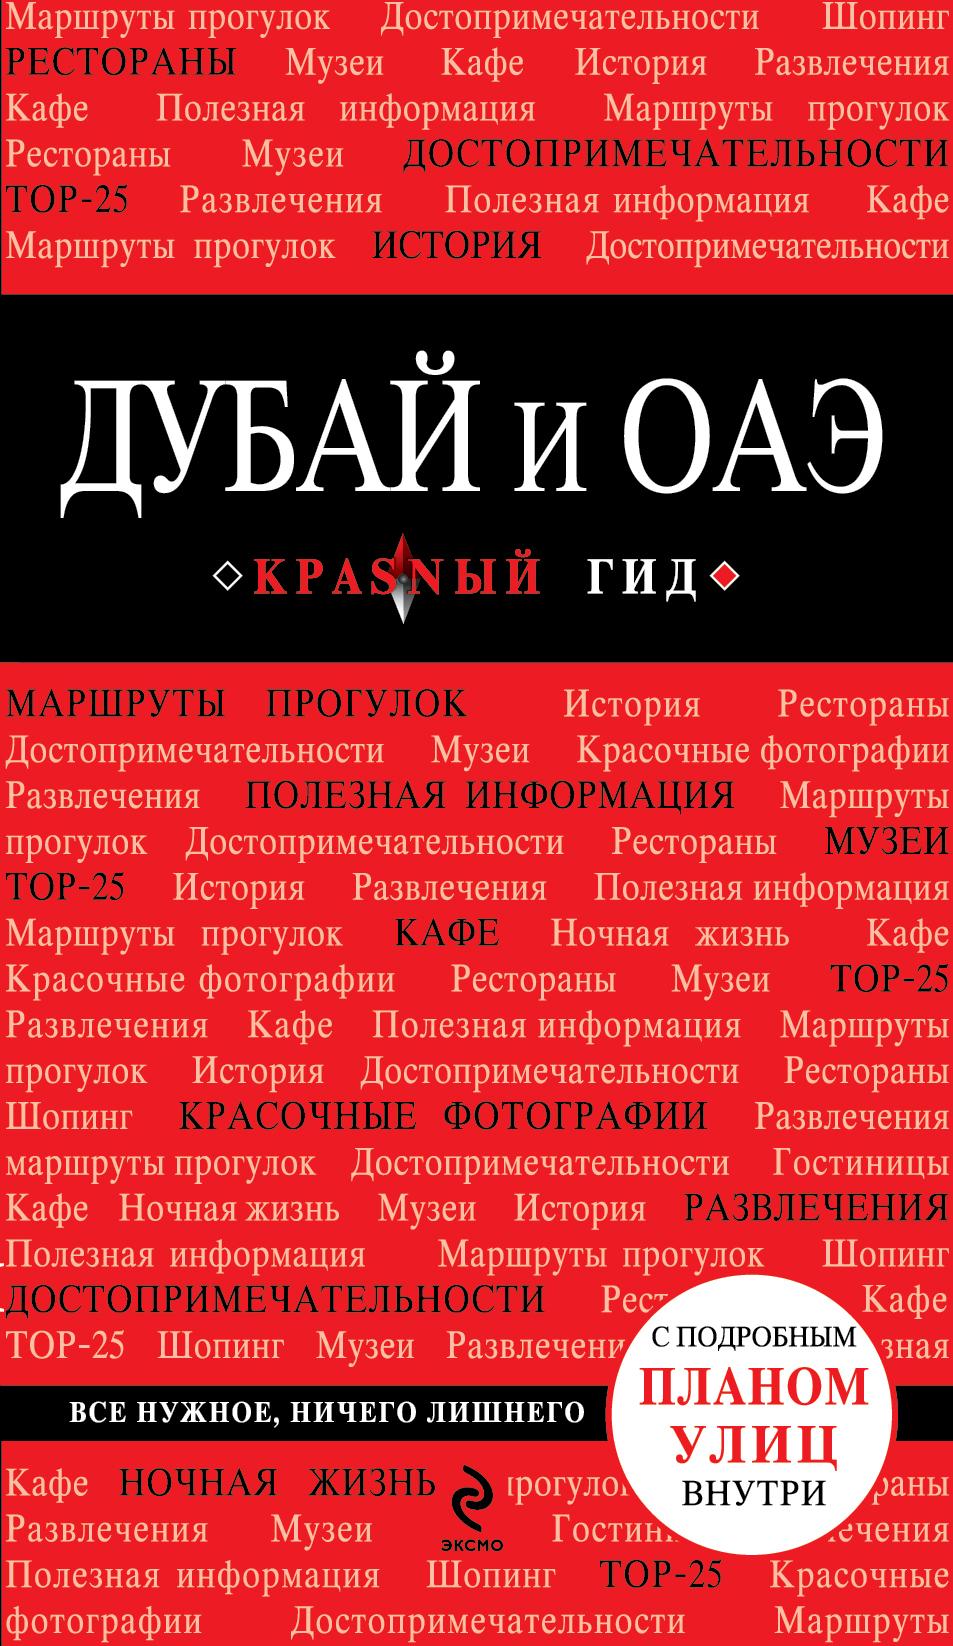 Кульков Е.Н. Дубай и ОАЭ. 2-е изд., испр. и доп.